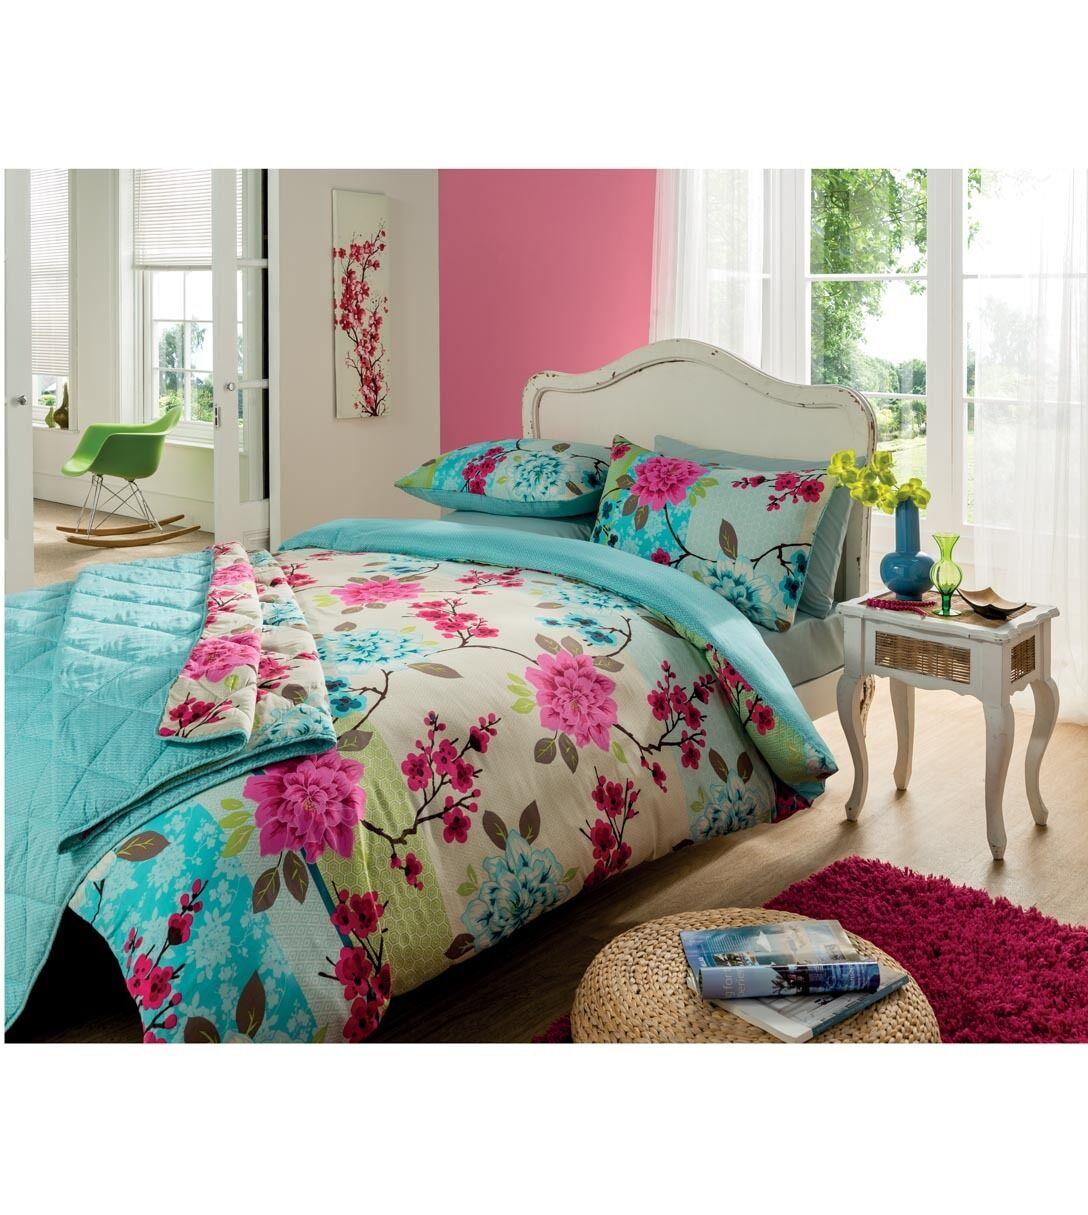 AQUA blueE STYLISH FLOWER POPPY DESIGNER LUXURY QUALITY BEDDING QUILT COVER SET